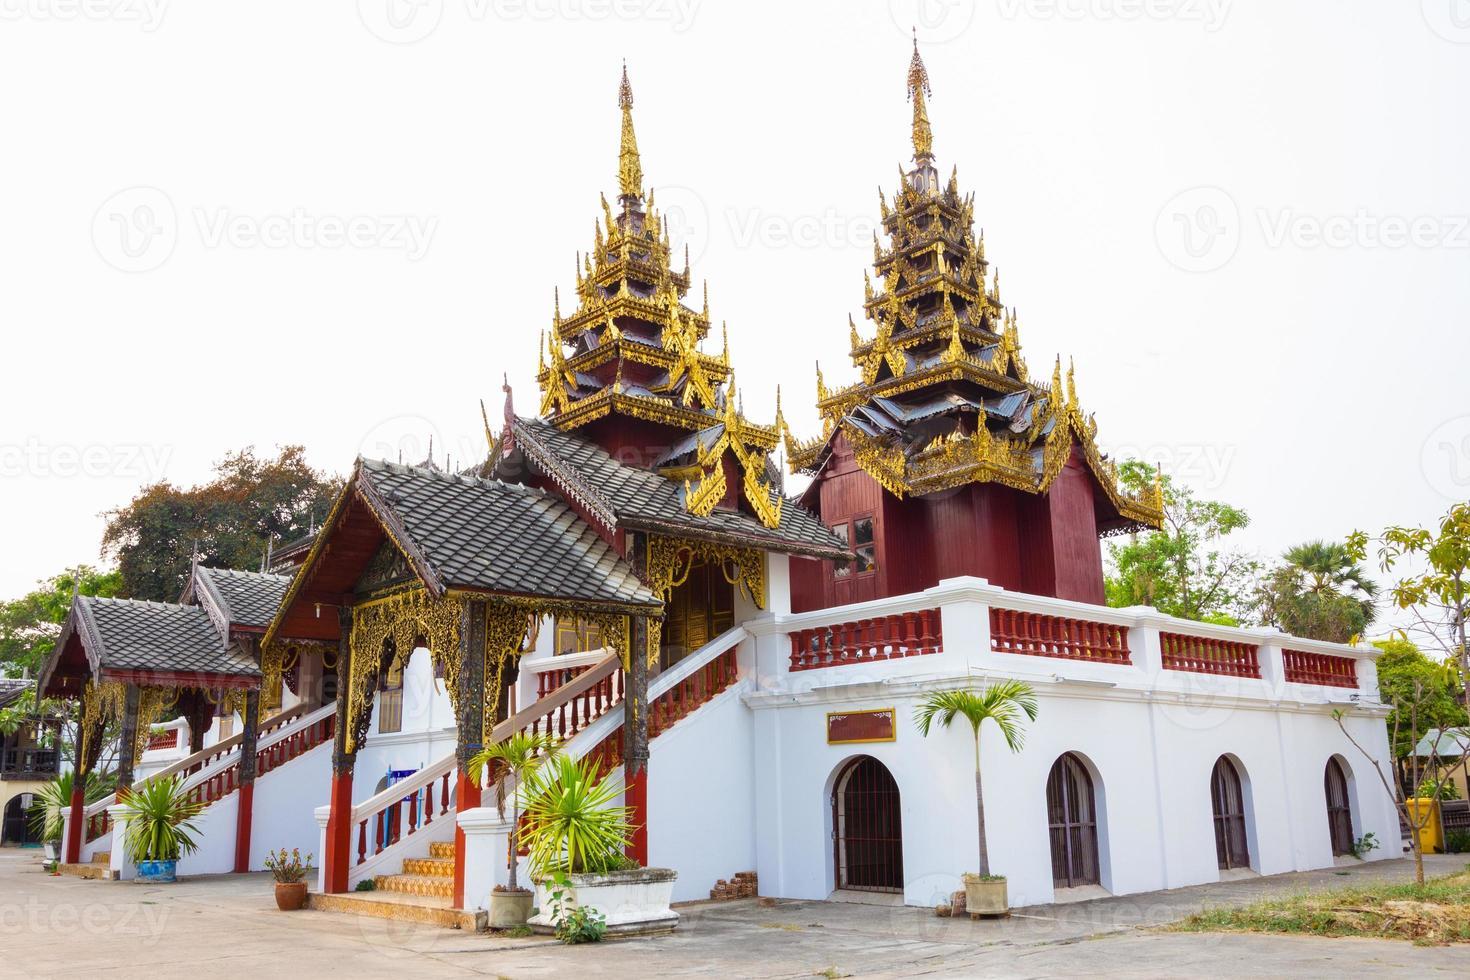 mooie Thaise tempel wat sri chum, tempel in lampang, thailand foto